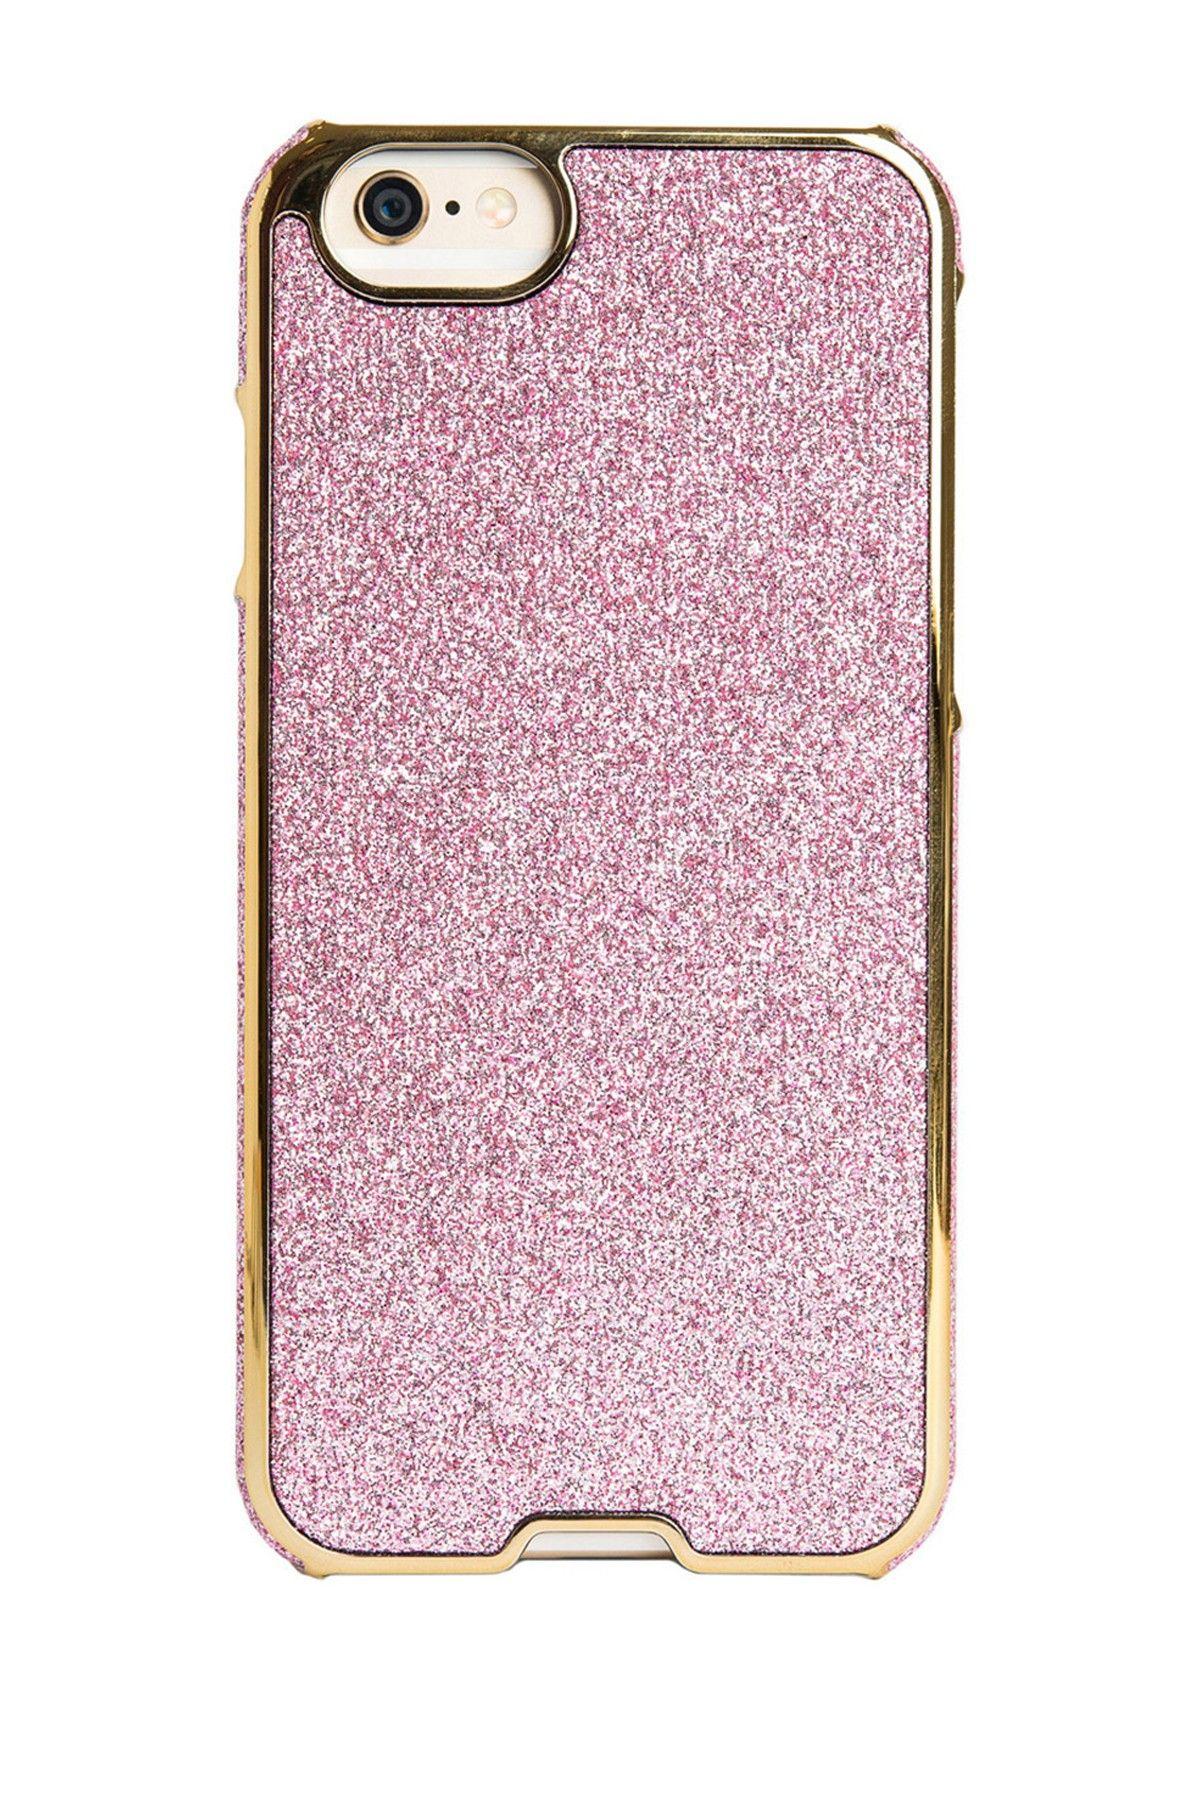 iphone se pink glitter case